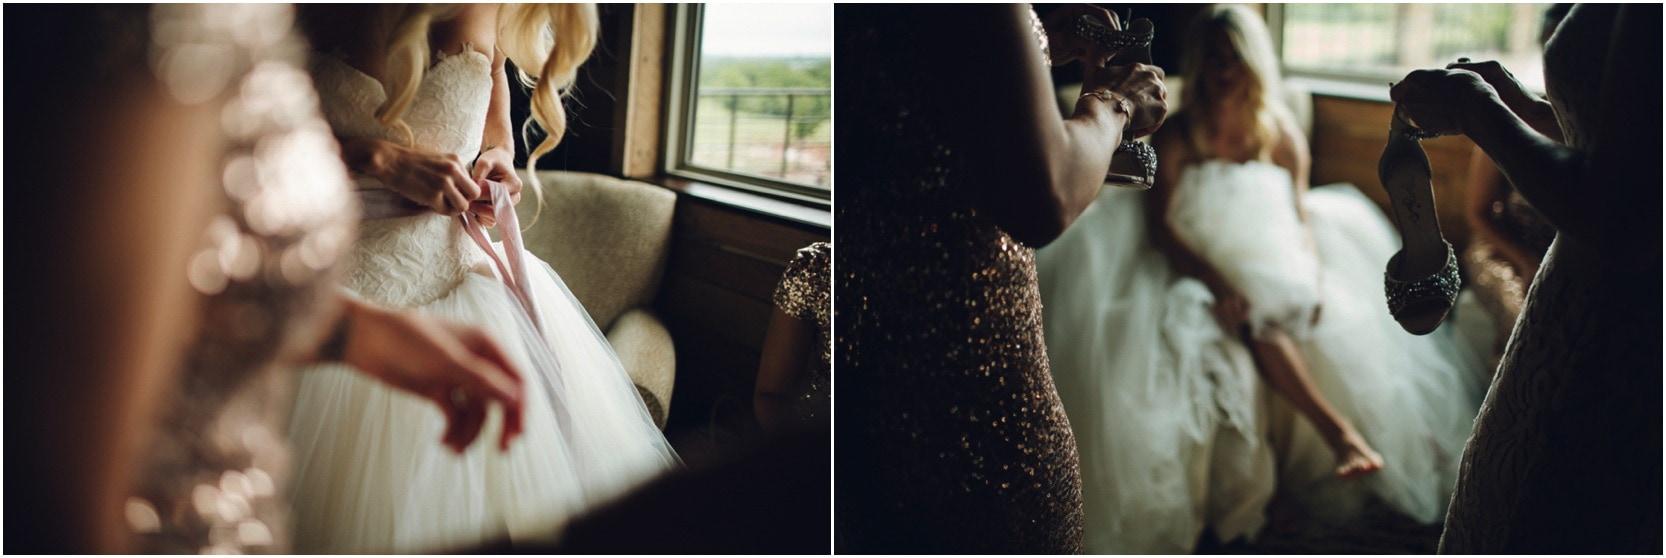 coderhillengburg_oklahoma_wedding__354_blogstomped